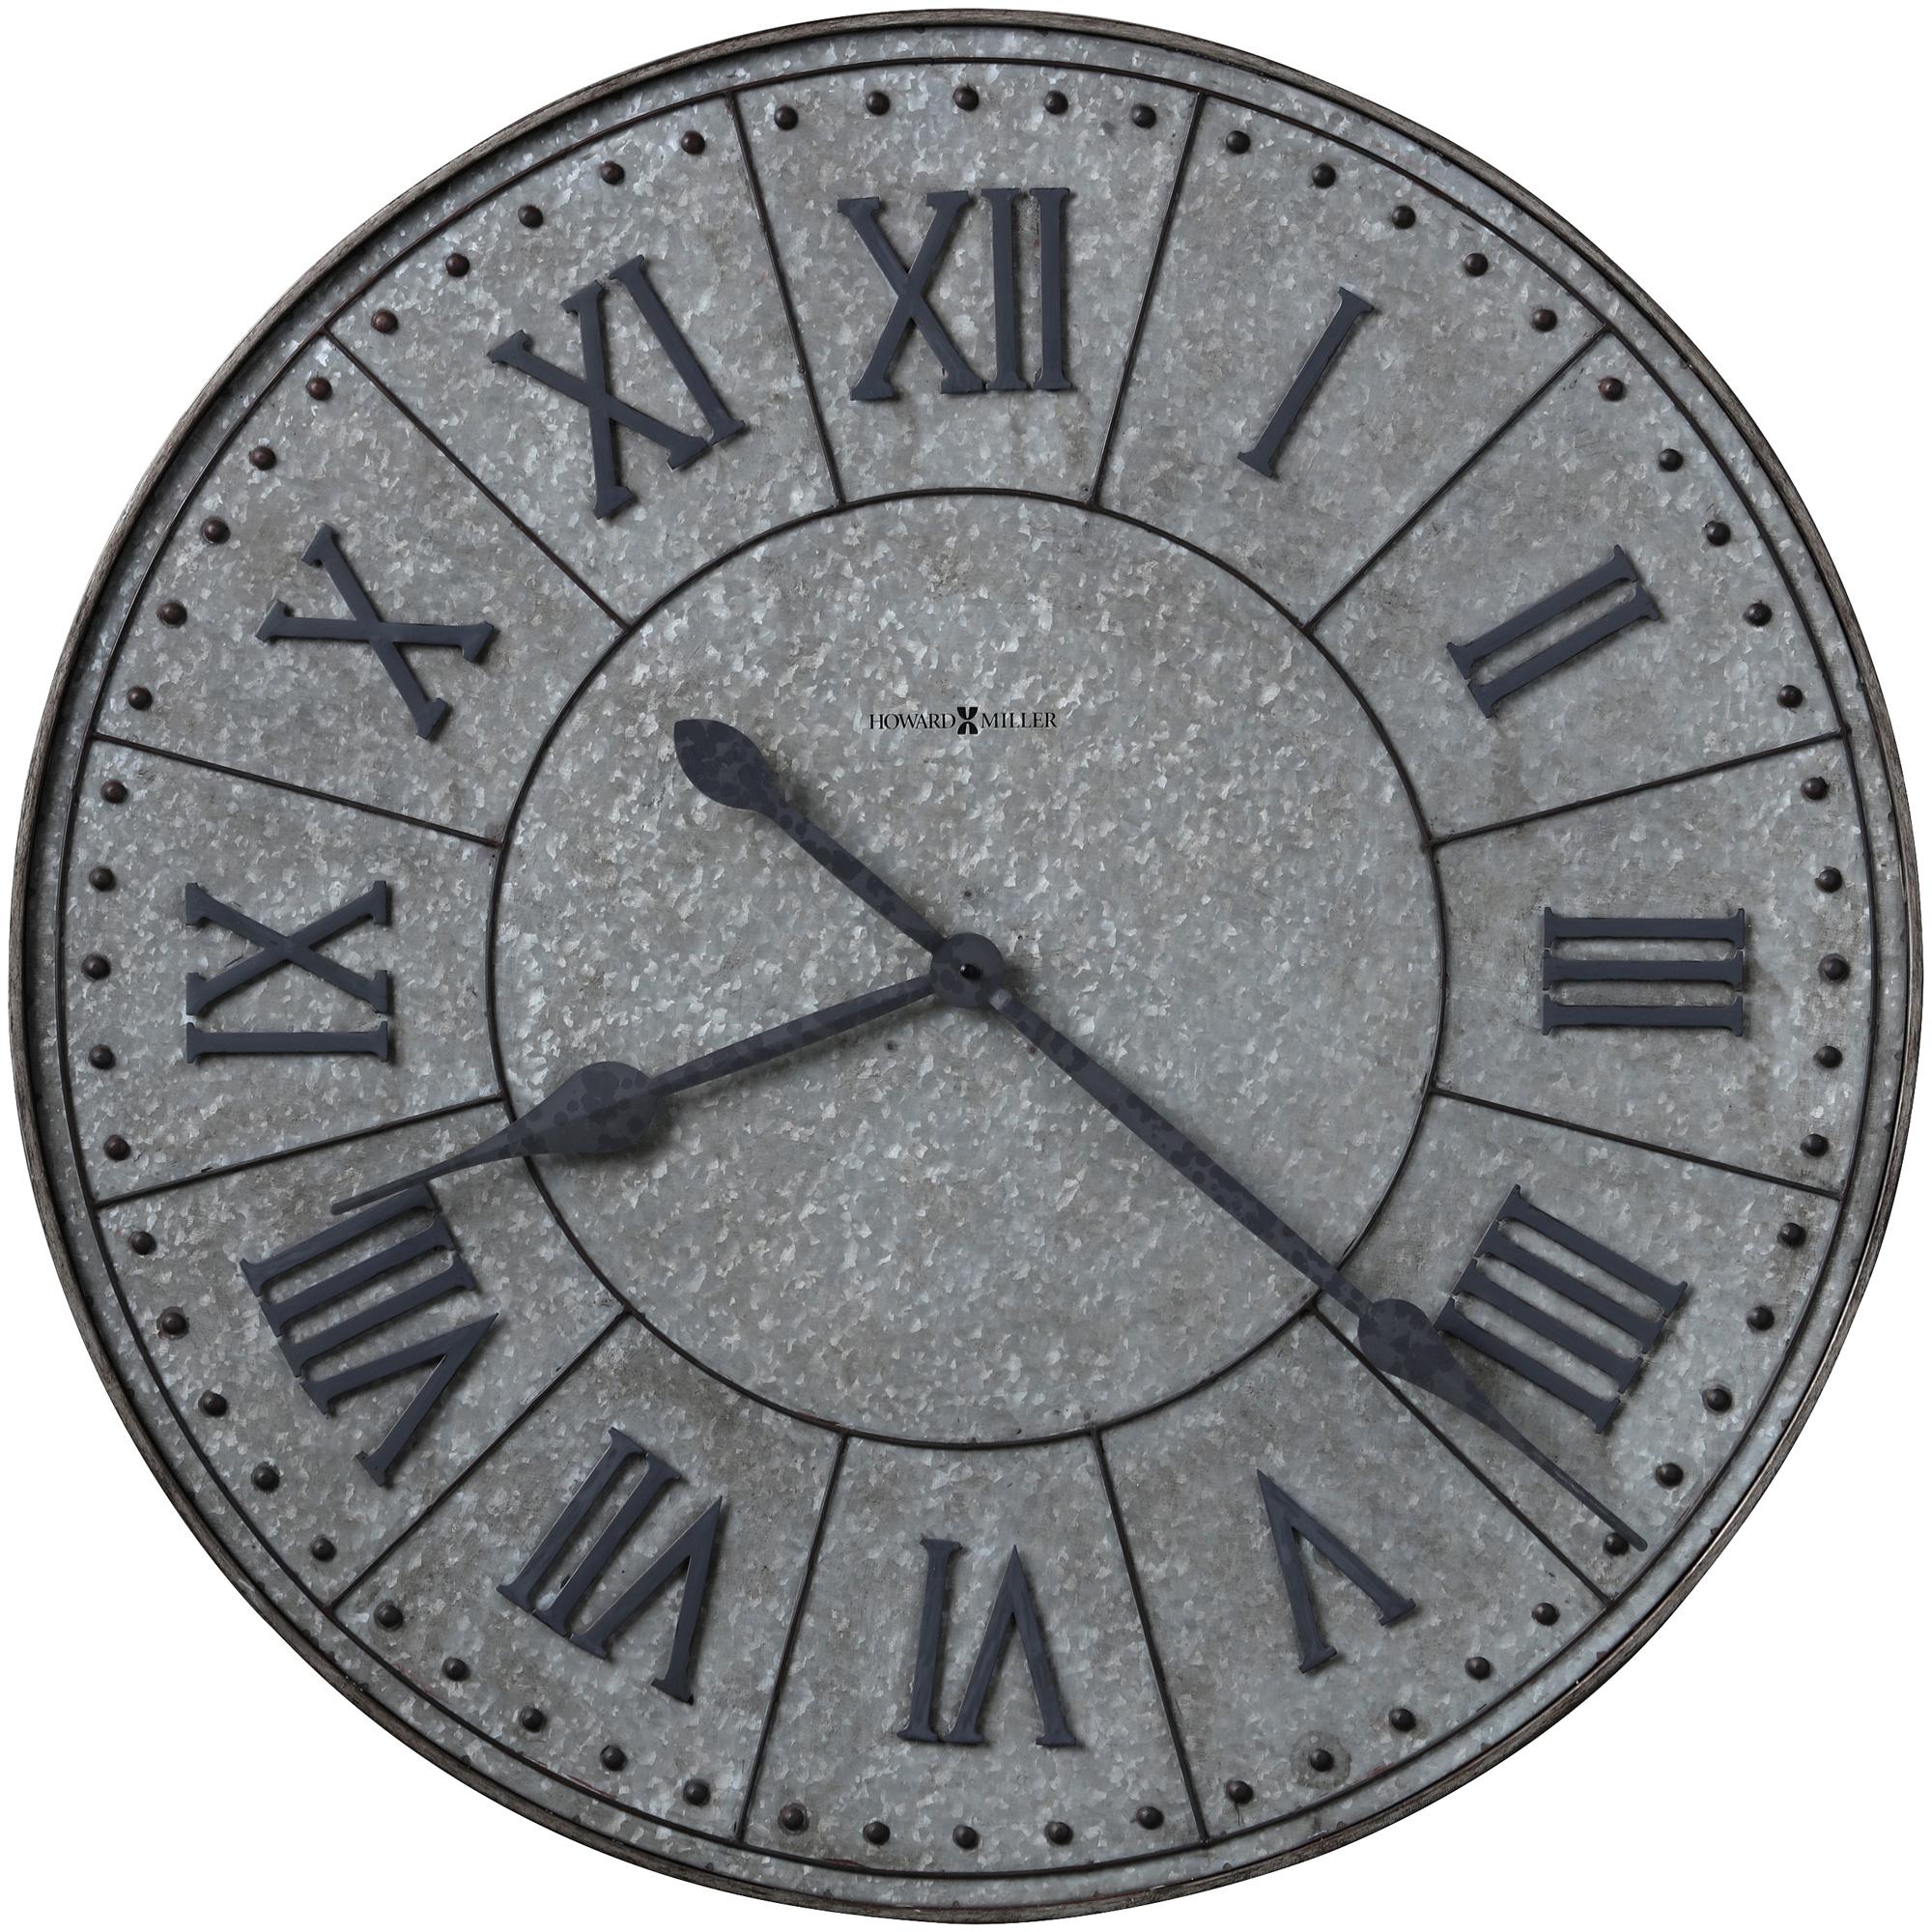 Howard Miller | Elaine Wall Clock